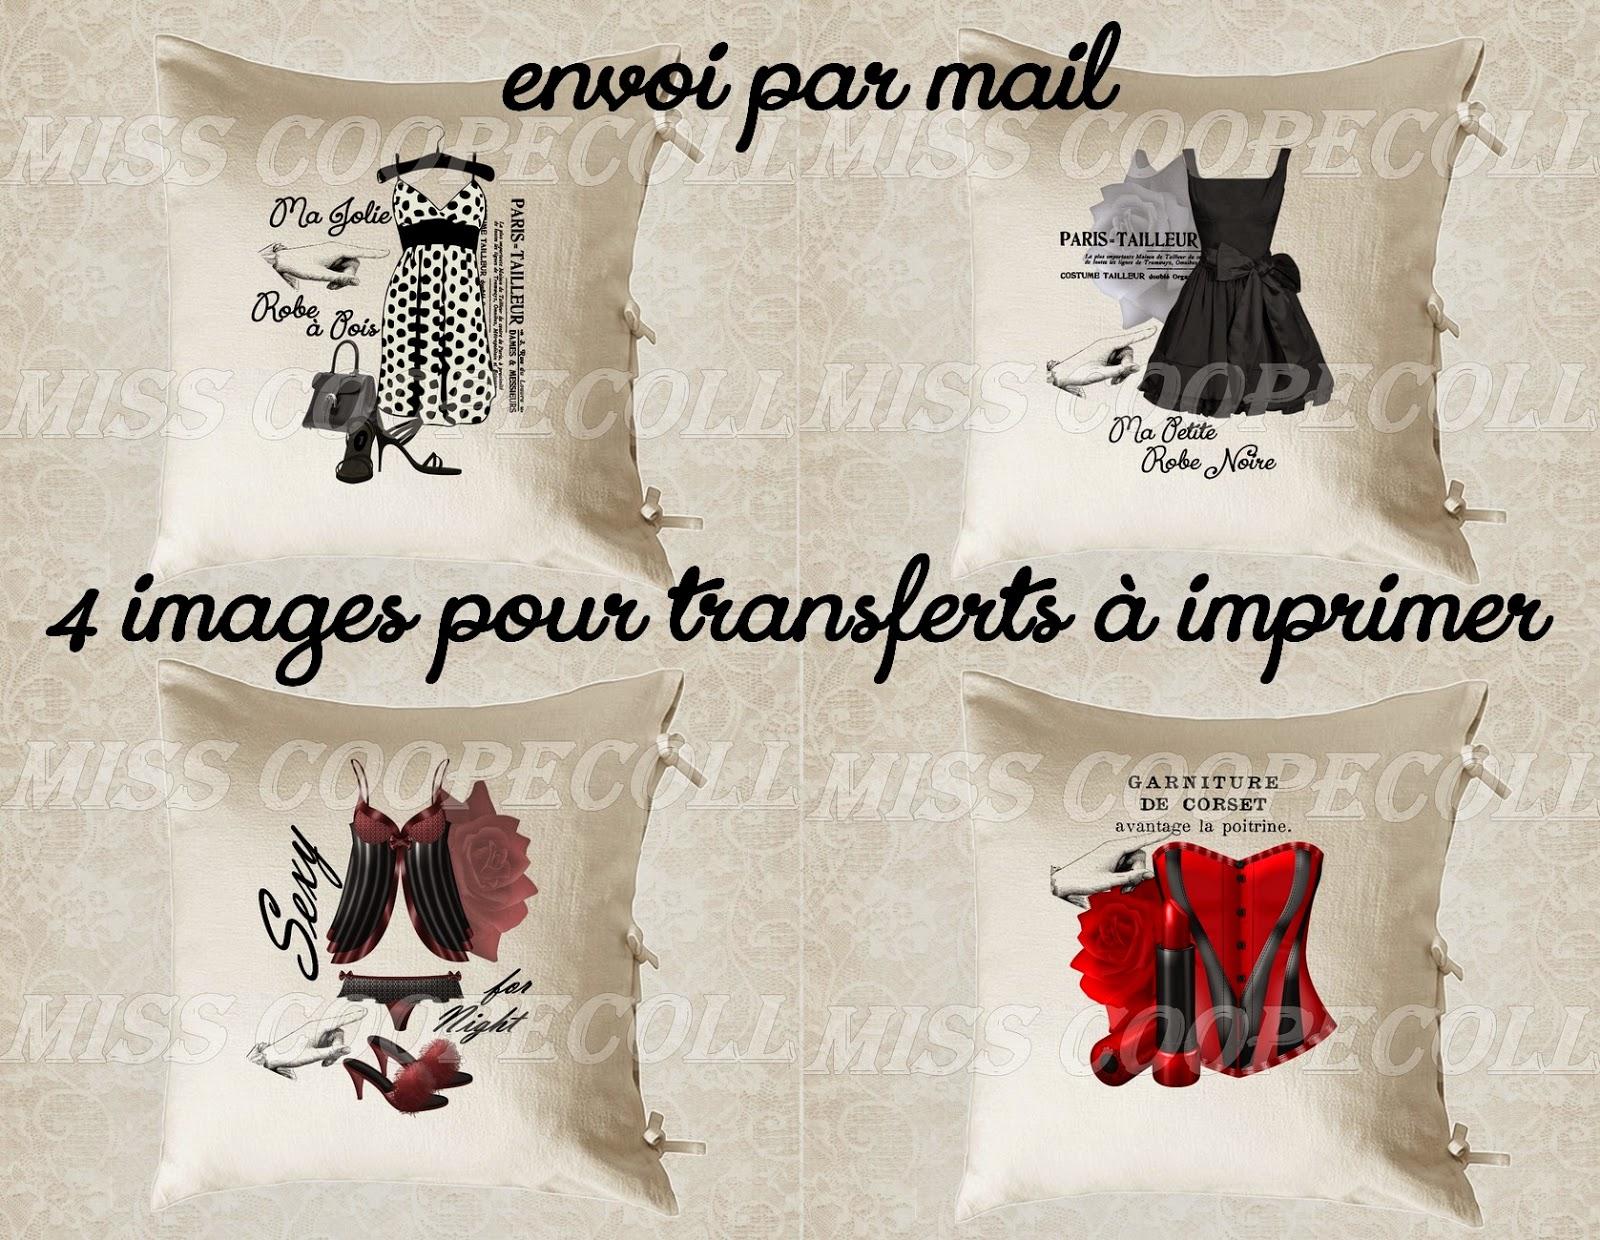 http://www.alittlemarket.com/loisirs-creatifs-scrapbooking/fr_4_images_digitales_pour_transfert_a_imprimer_ma_garde_robe_envoi_par_mail_-8674261.html